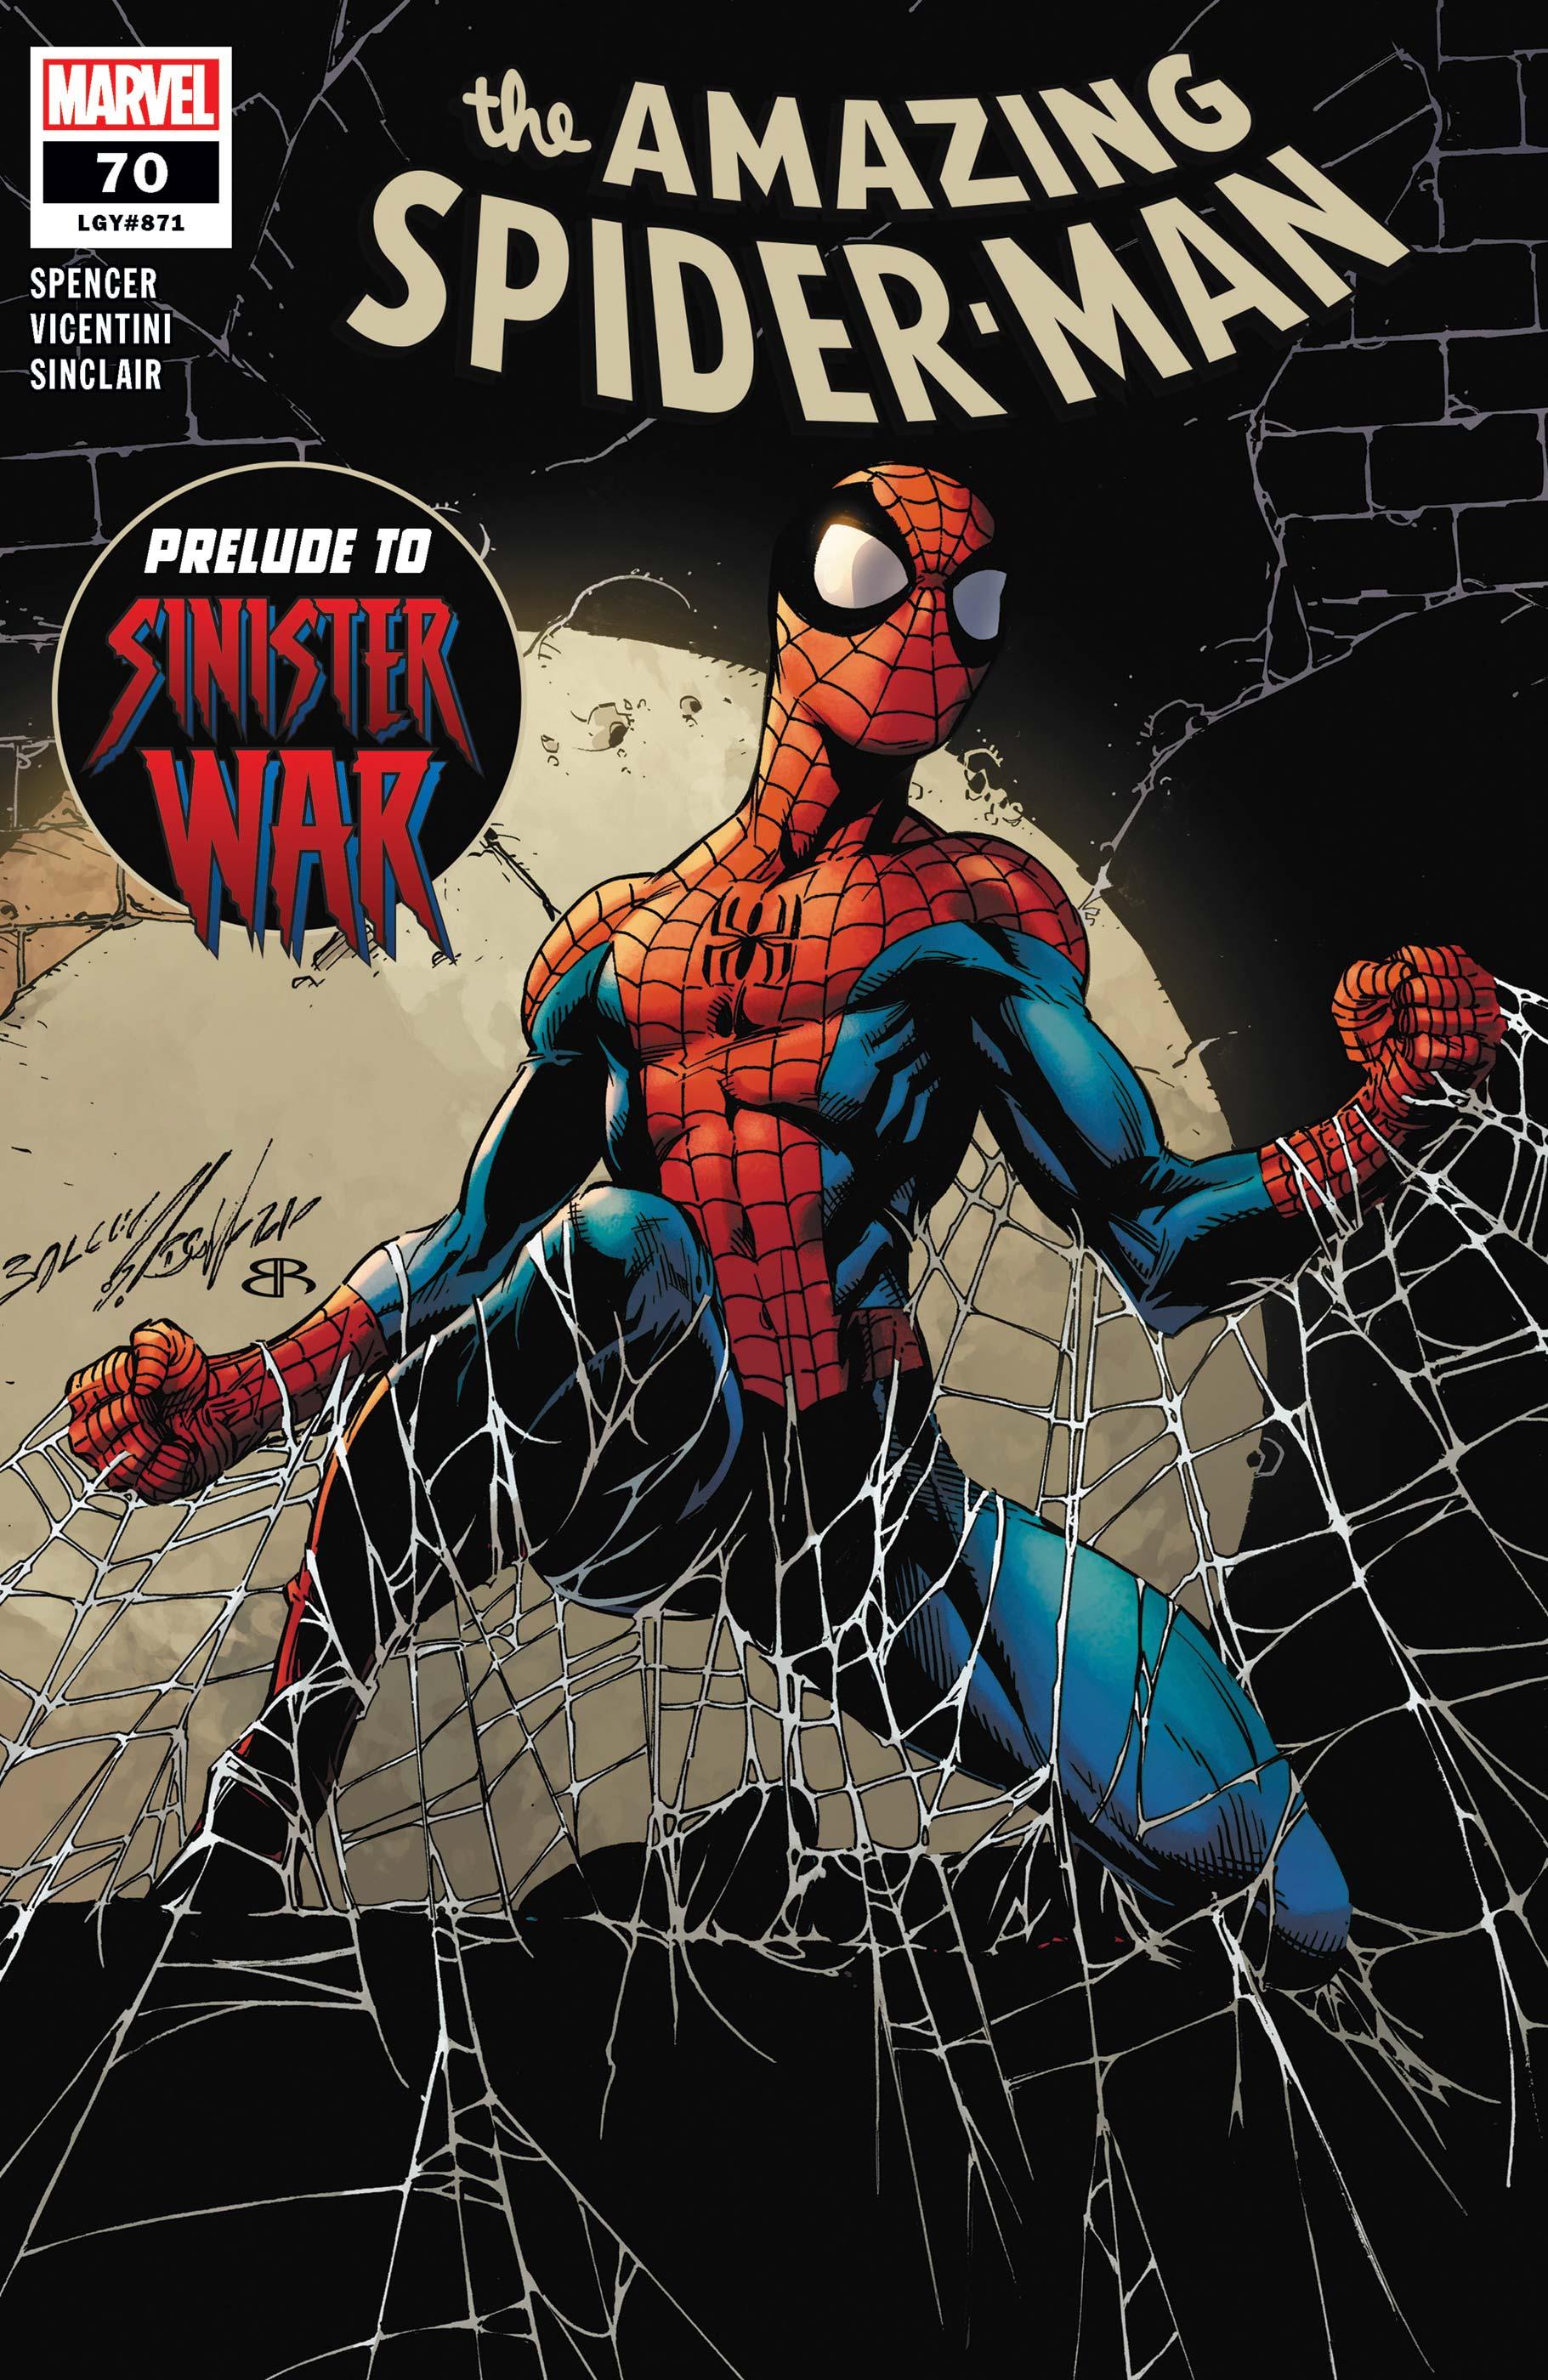 The Amazing Spider-Man (2018) #70